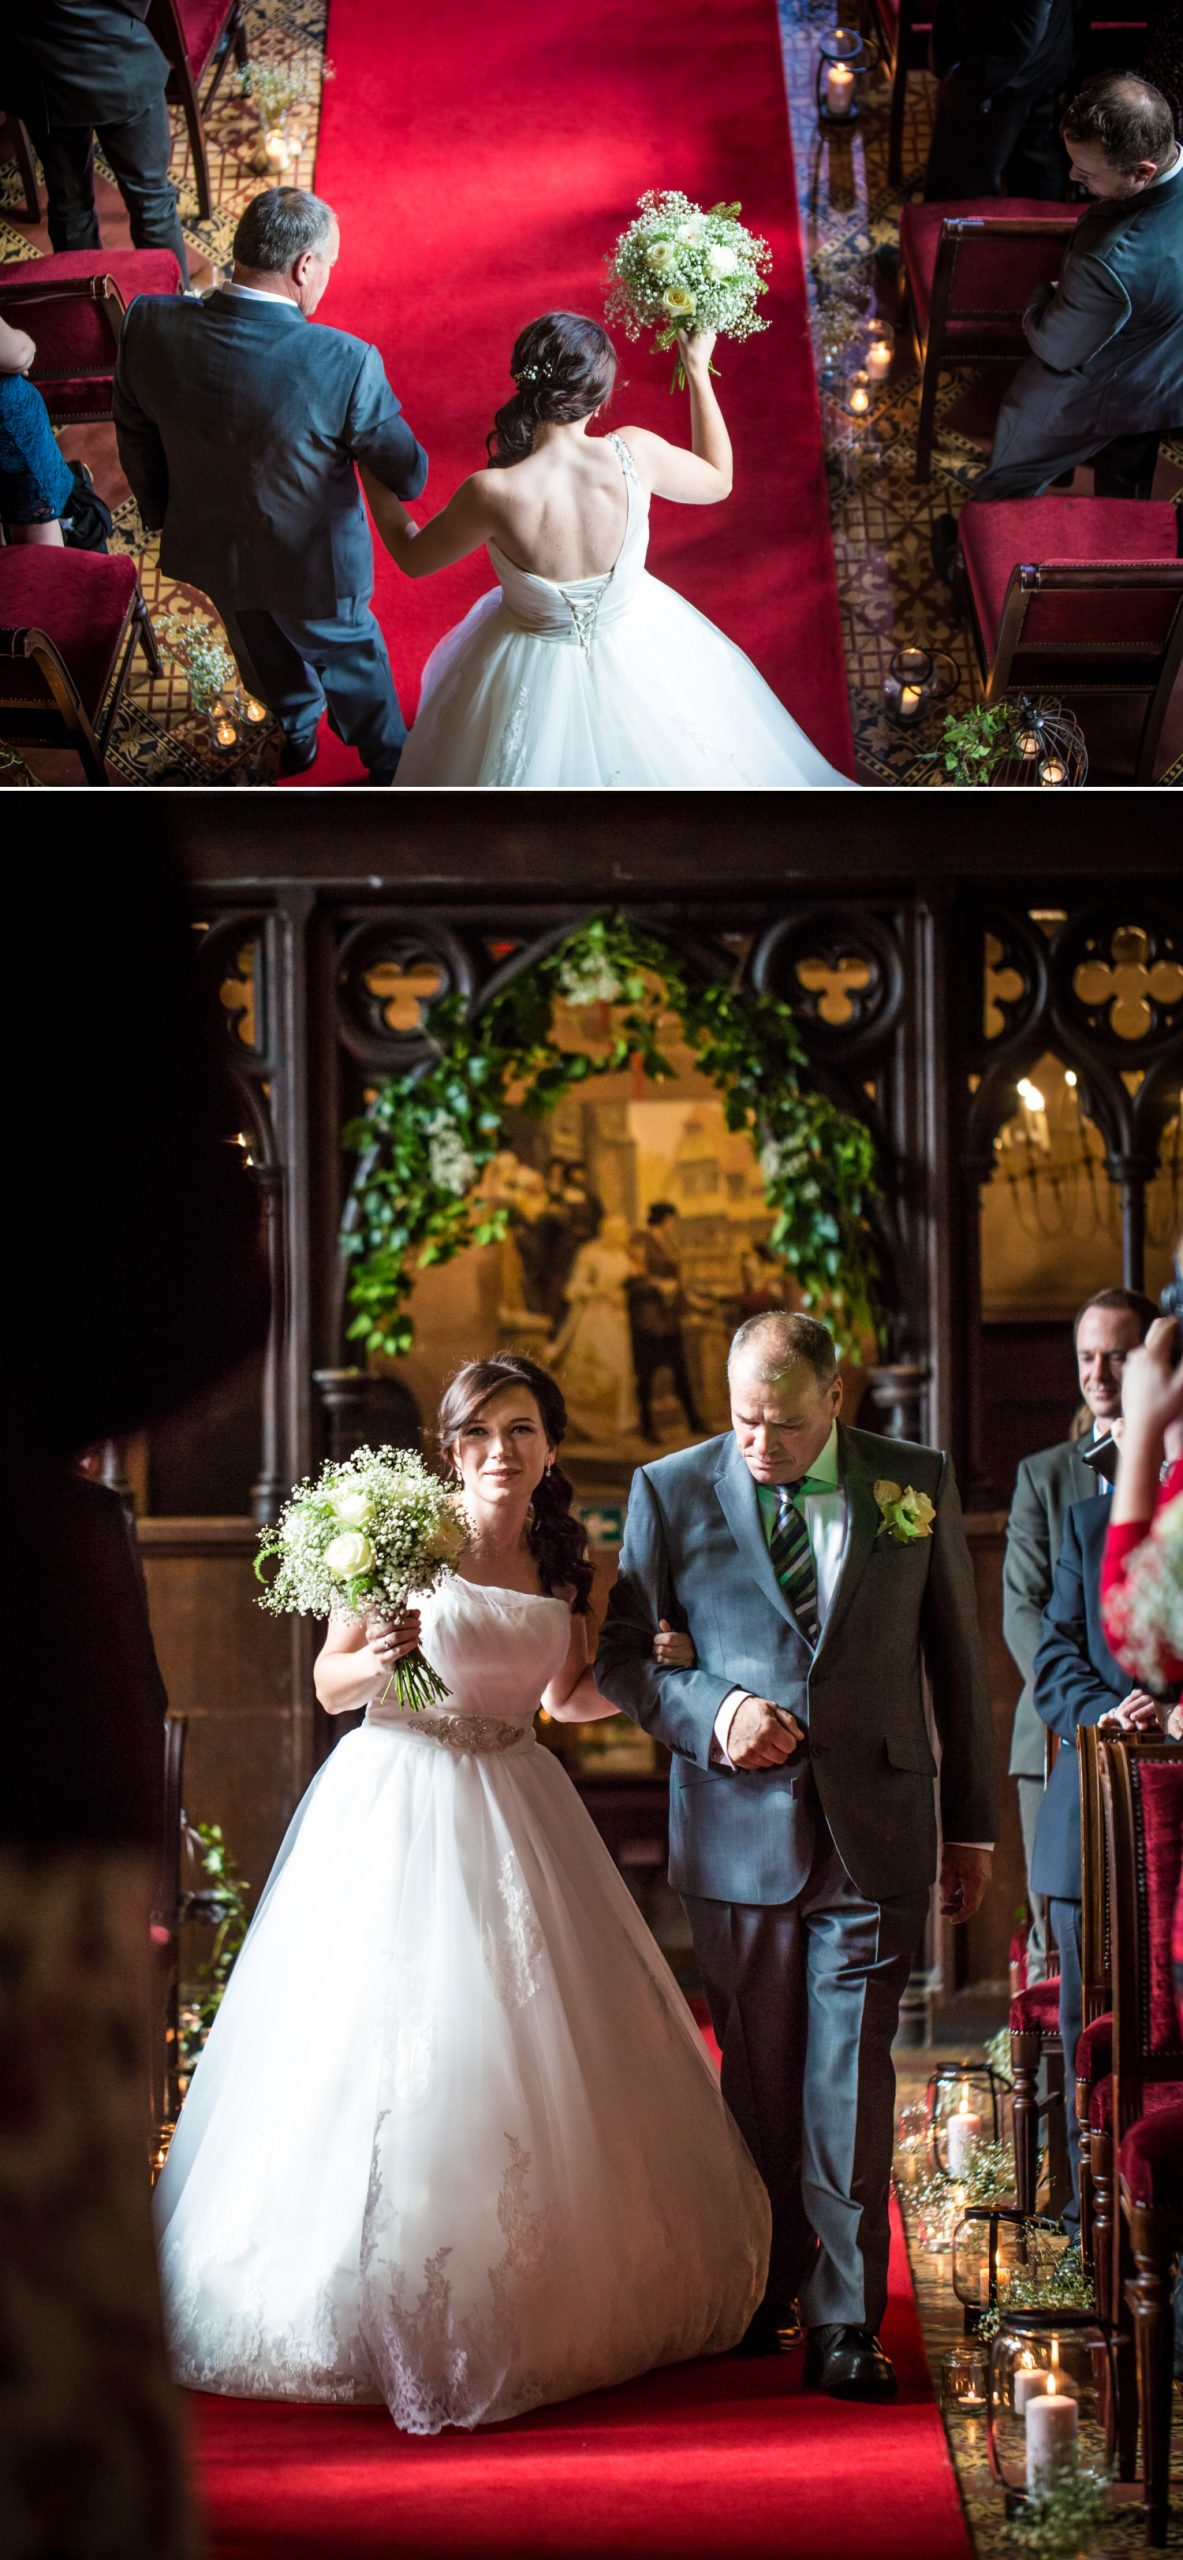 Wedding Photography ceremony at Peckforton Castle